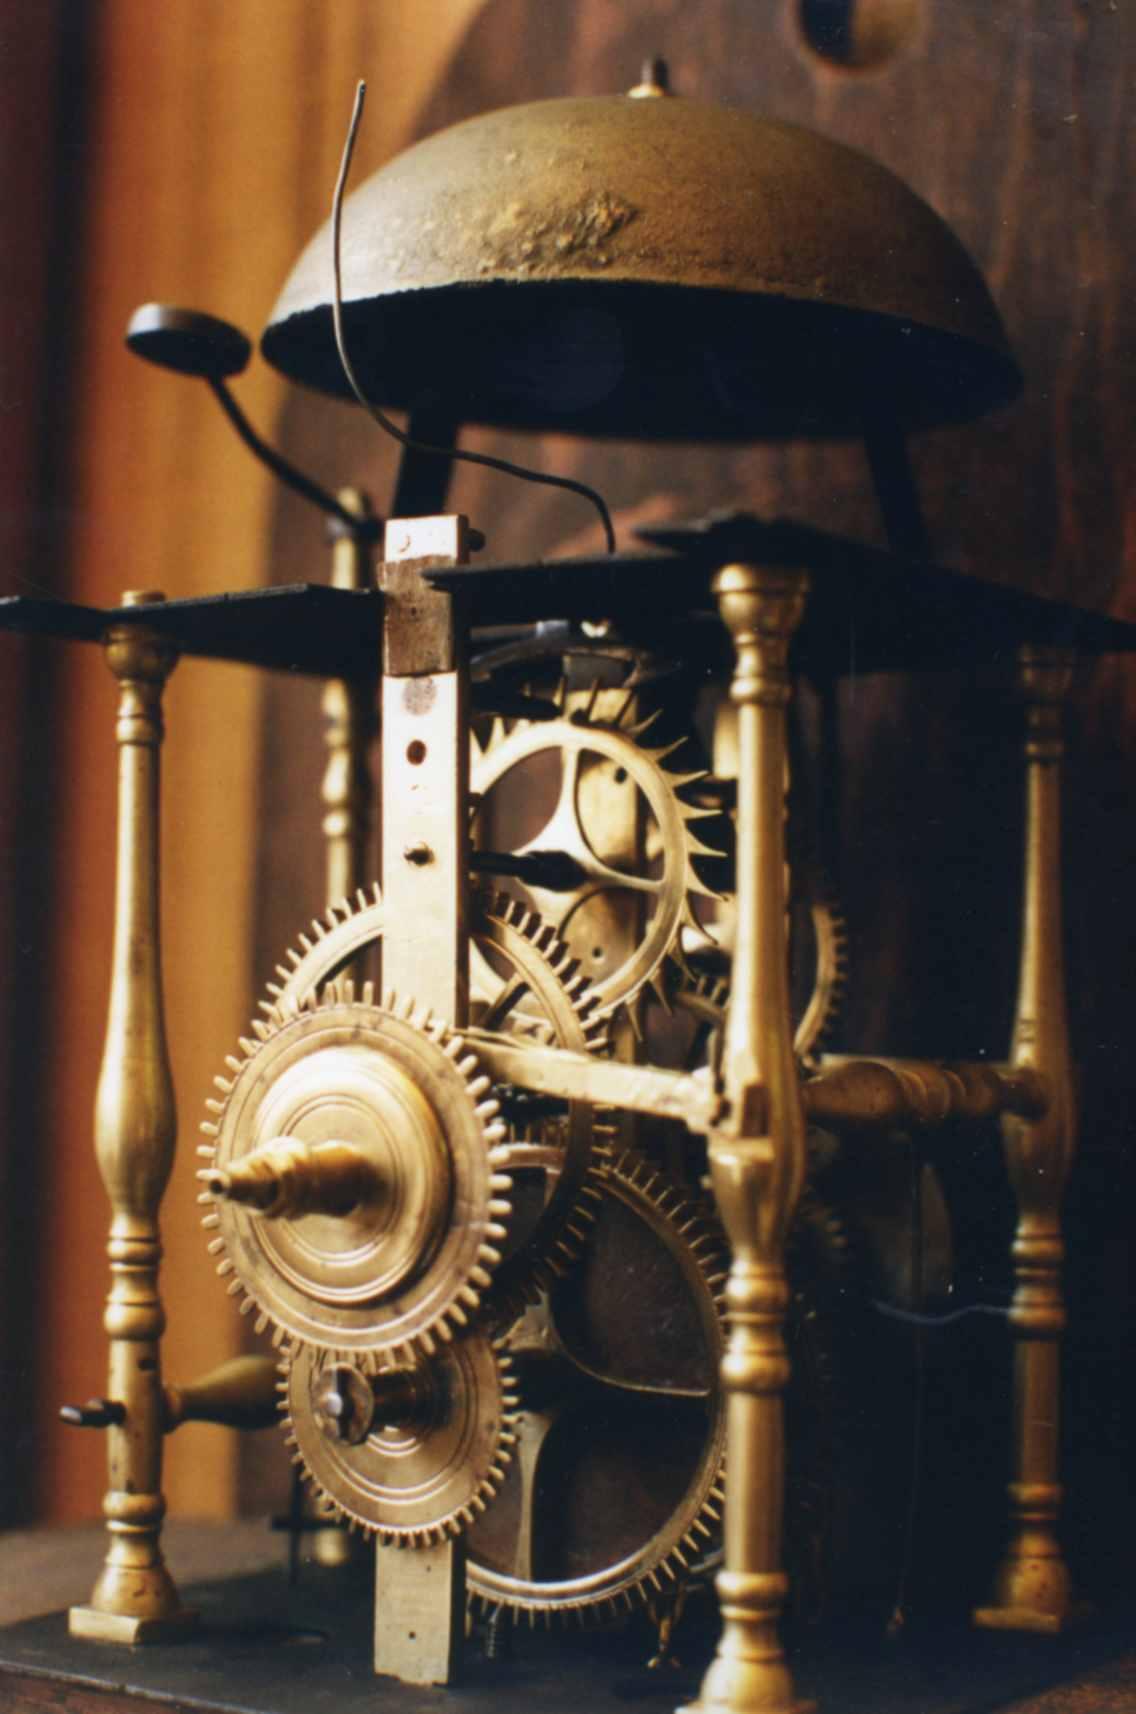 Horloge hollandaise du XVIIIème